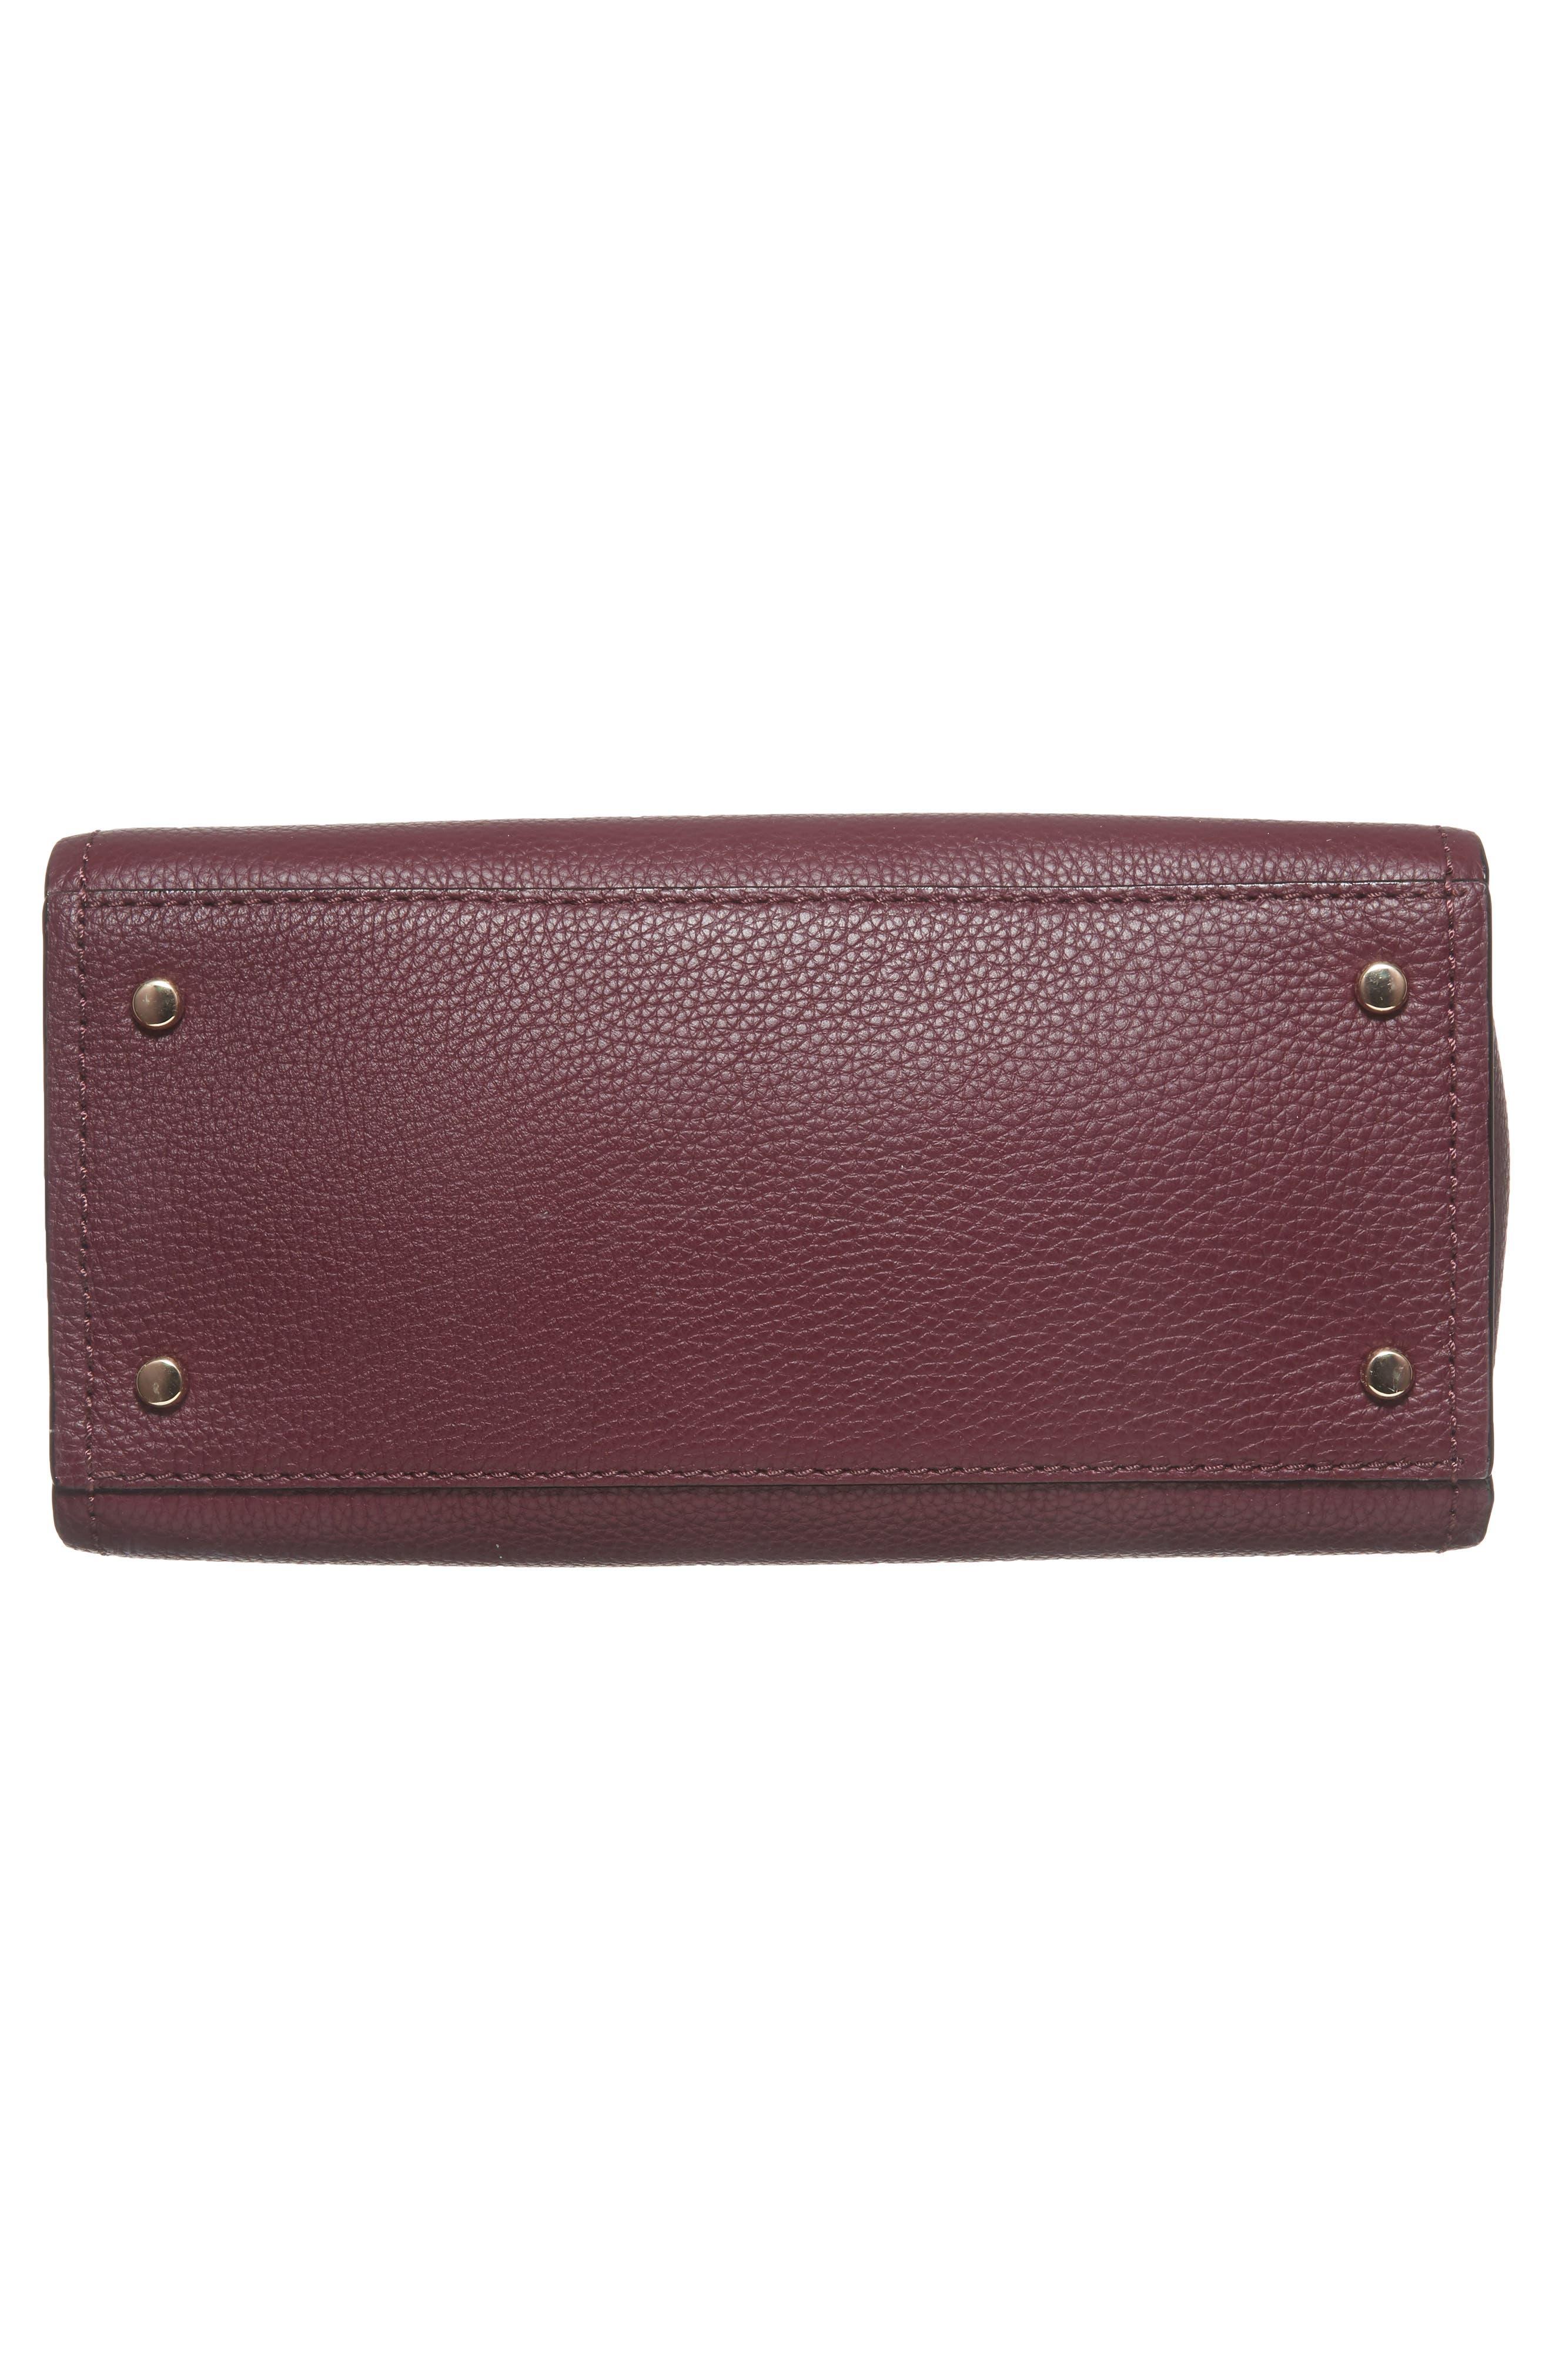 jackson street small kiernan leather top handle satchel,                             Alternate thumbnail 6, color,                             545